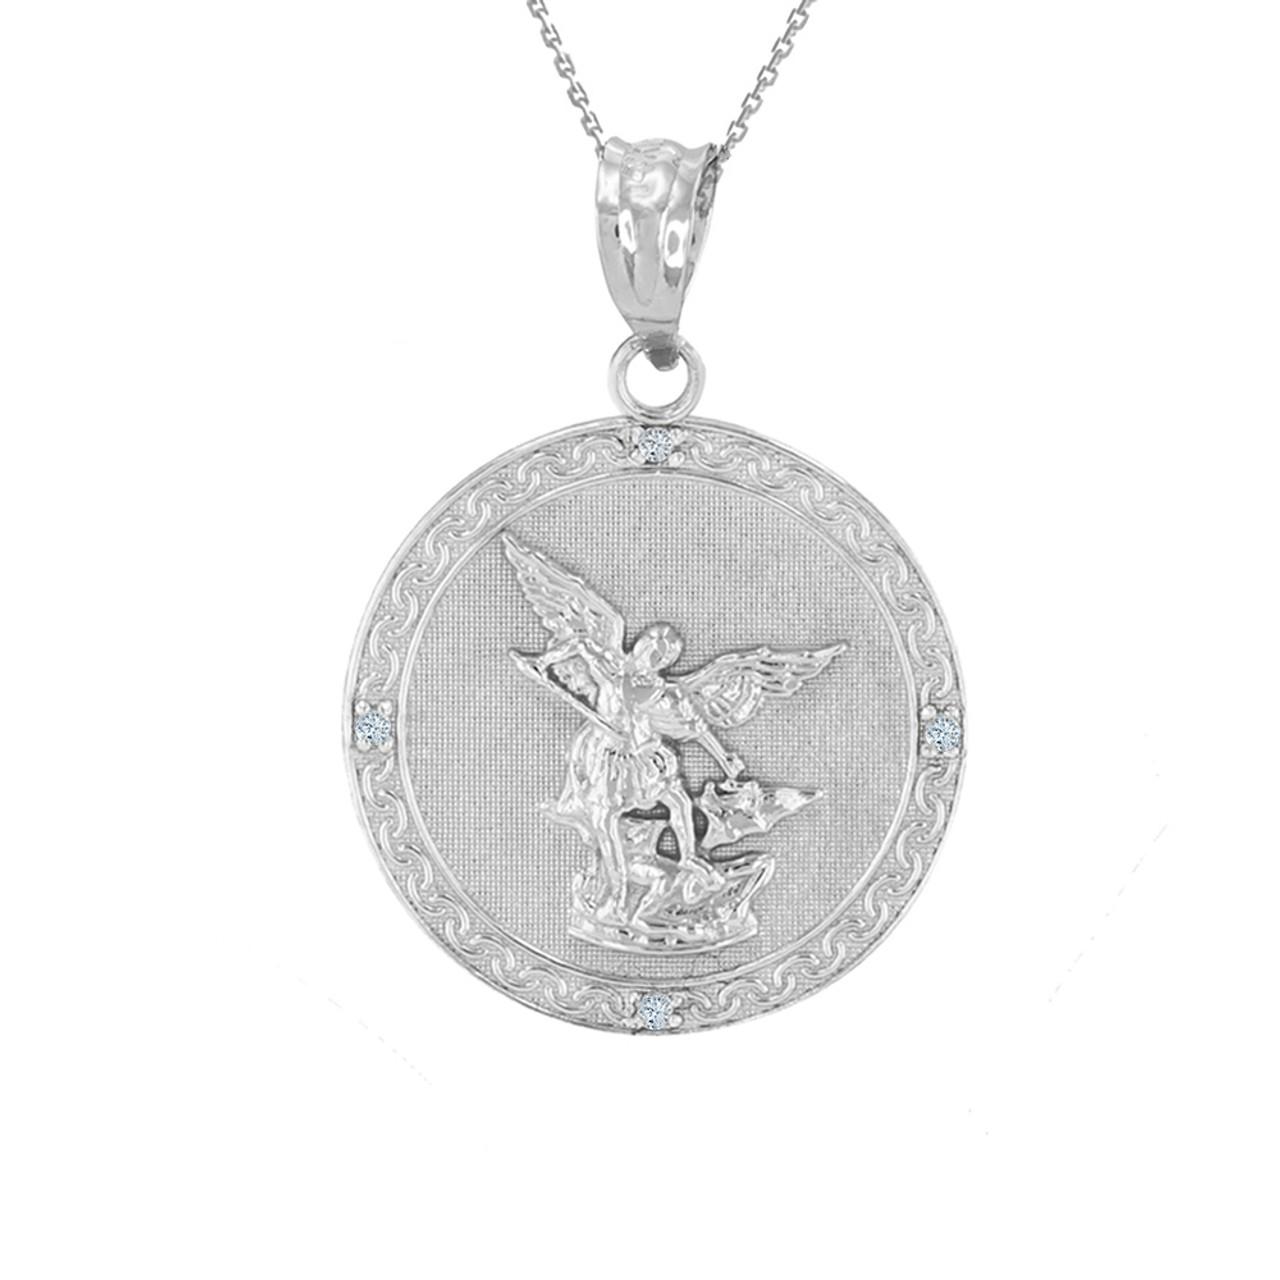 White gold st michael archangel diamond pendant necklace 102 aloadofball Choice Image